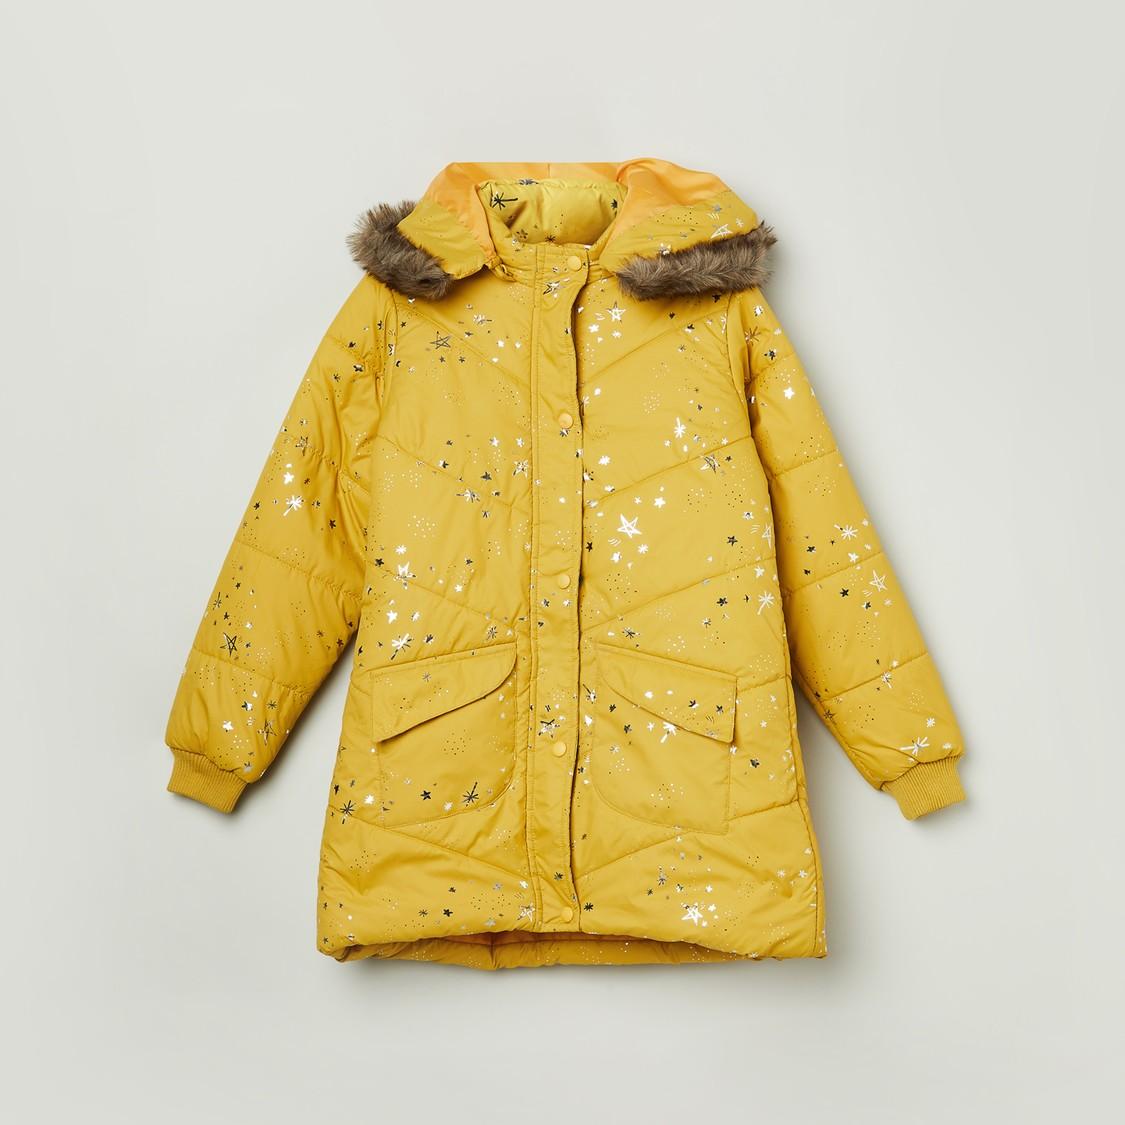 Max Printed Puffed Full Sleeves Hooded Jacket